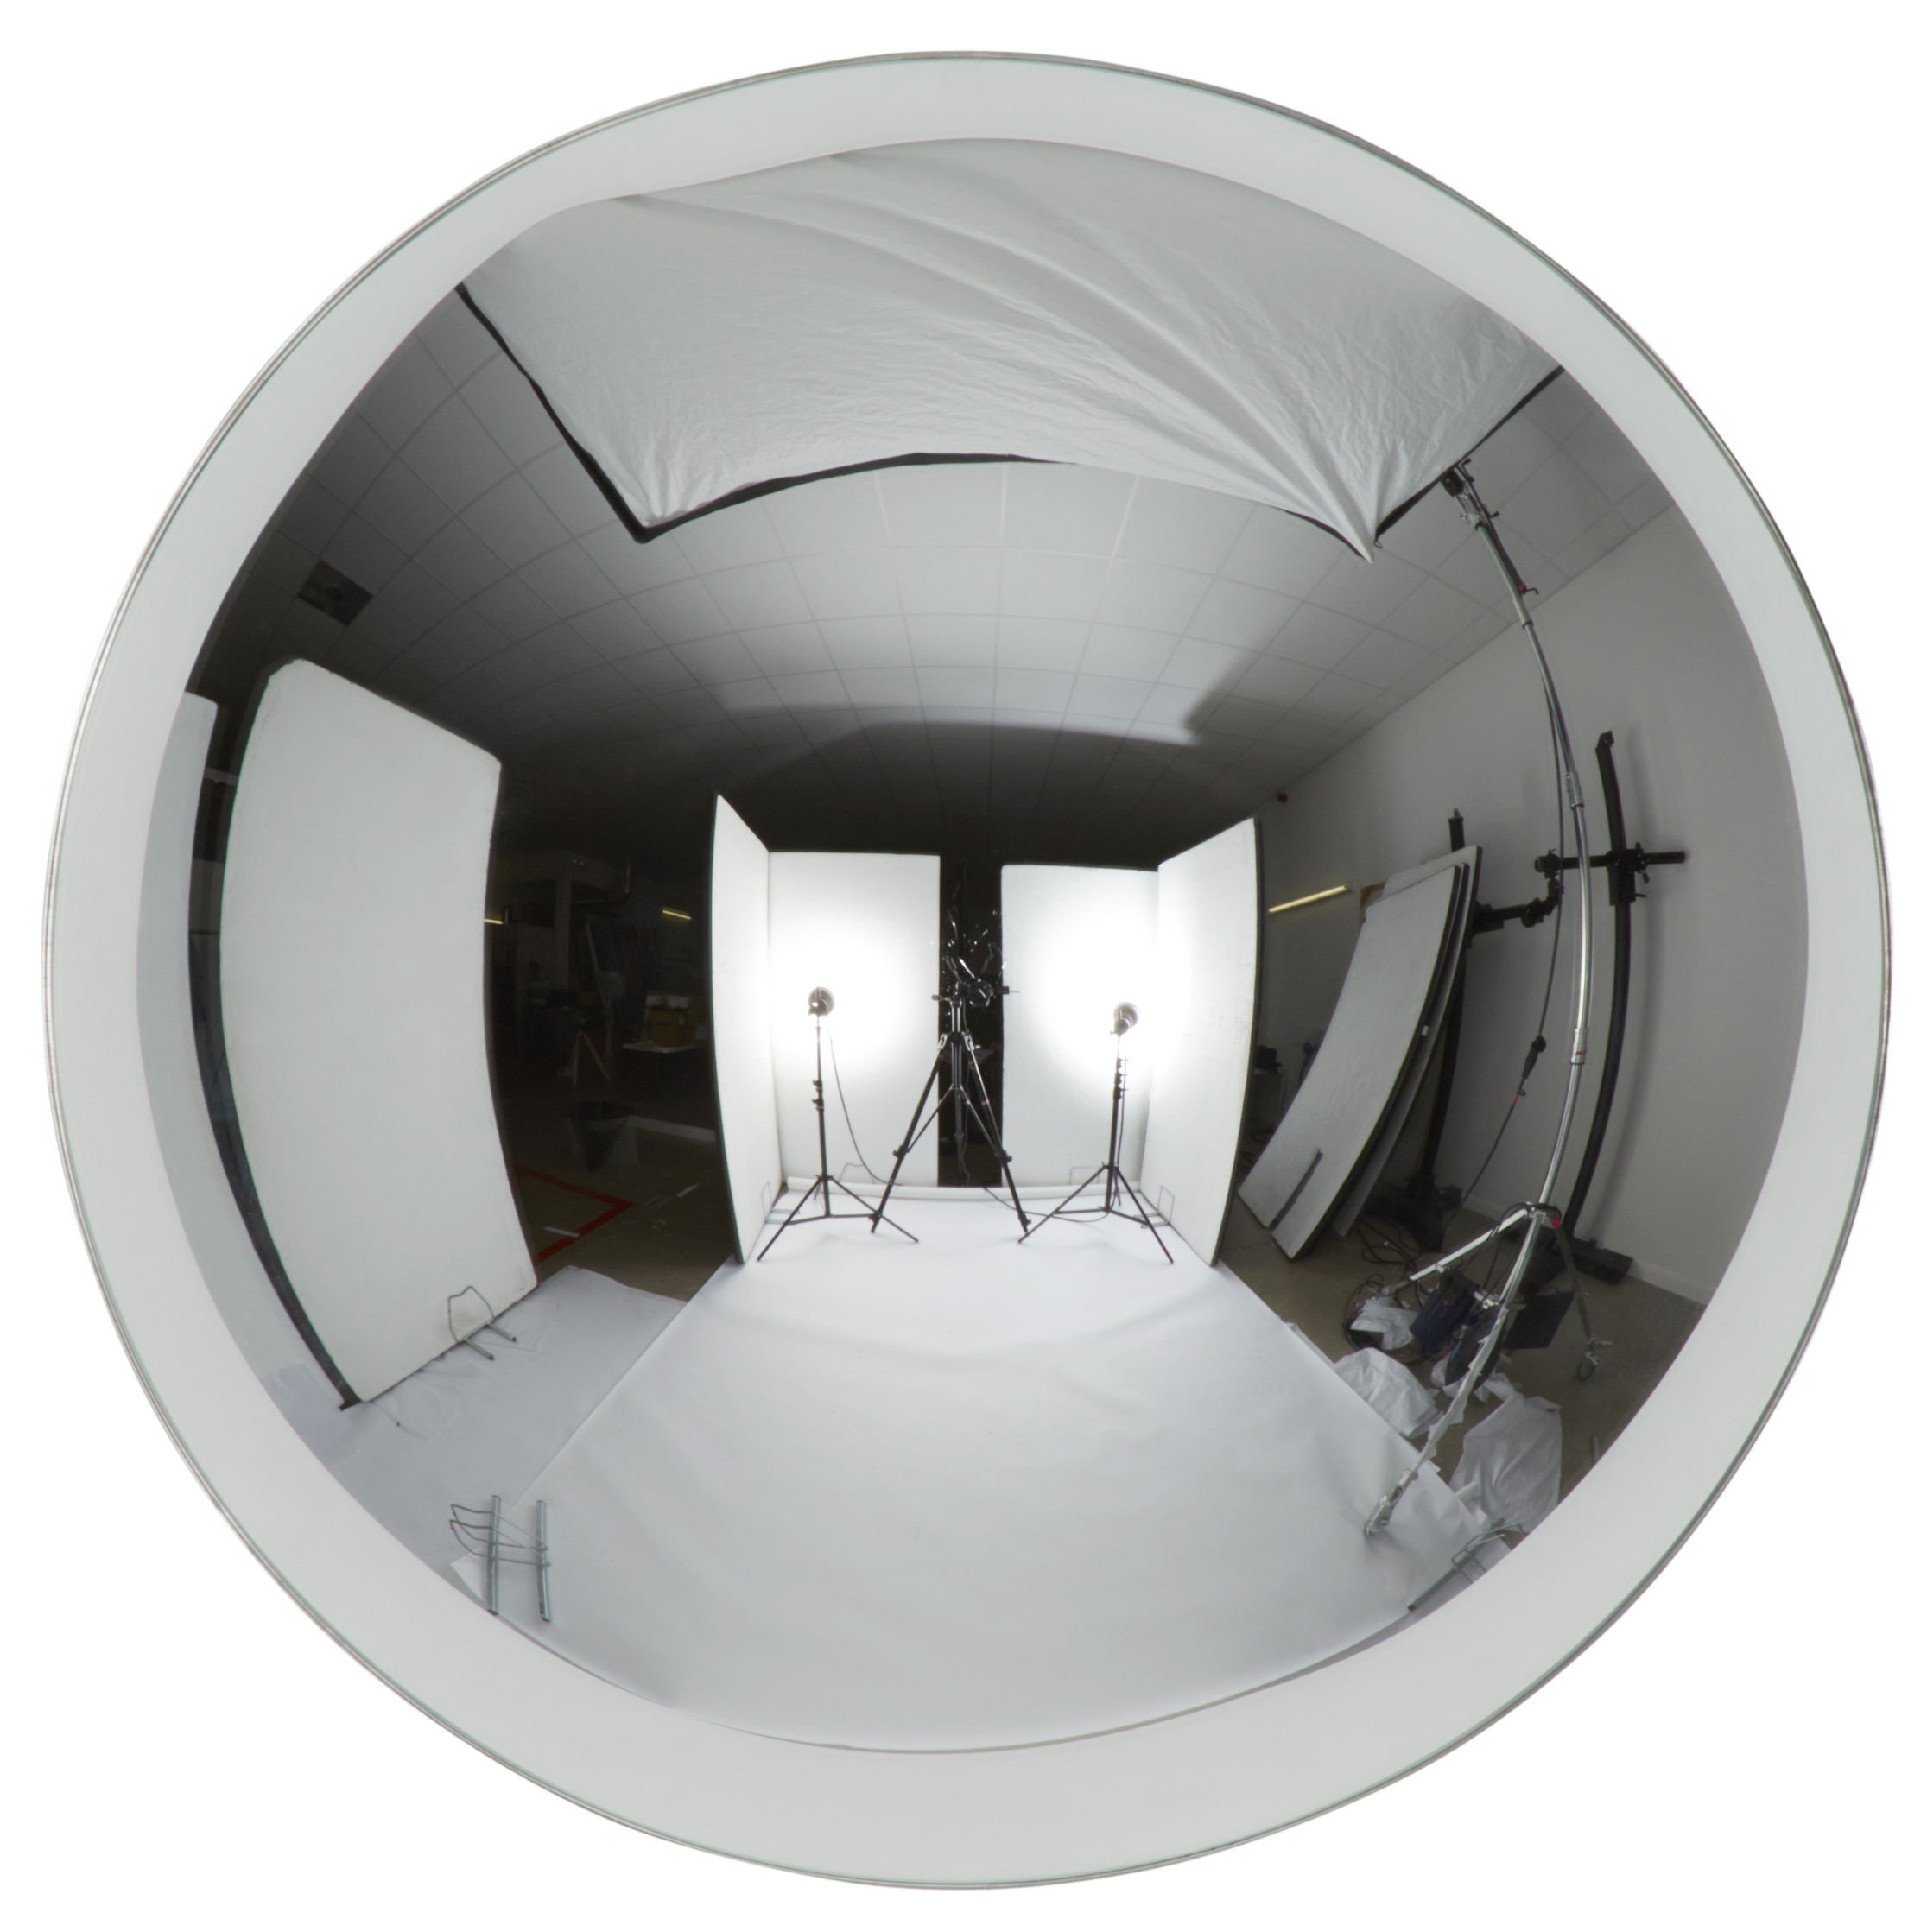 miroir dome convexe 40 cm chrom tom dixon. Black Bedroom Furniture Sets. Home Design Ideas